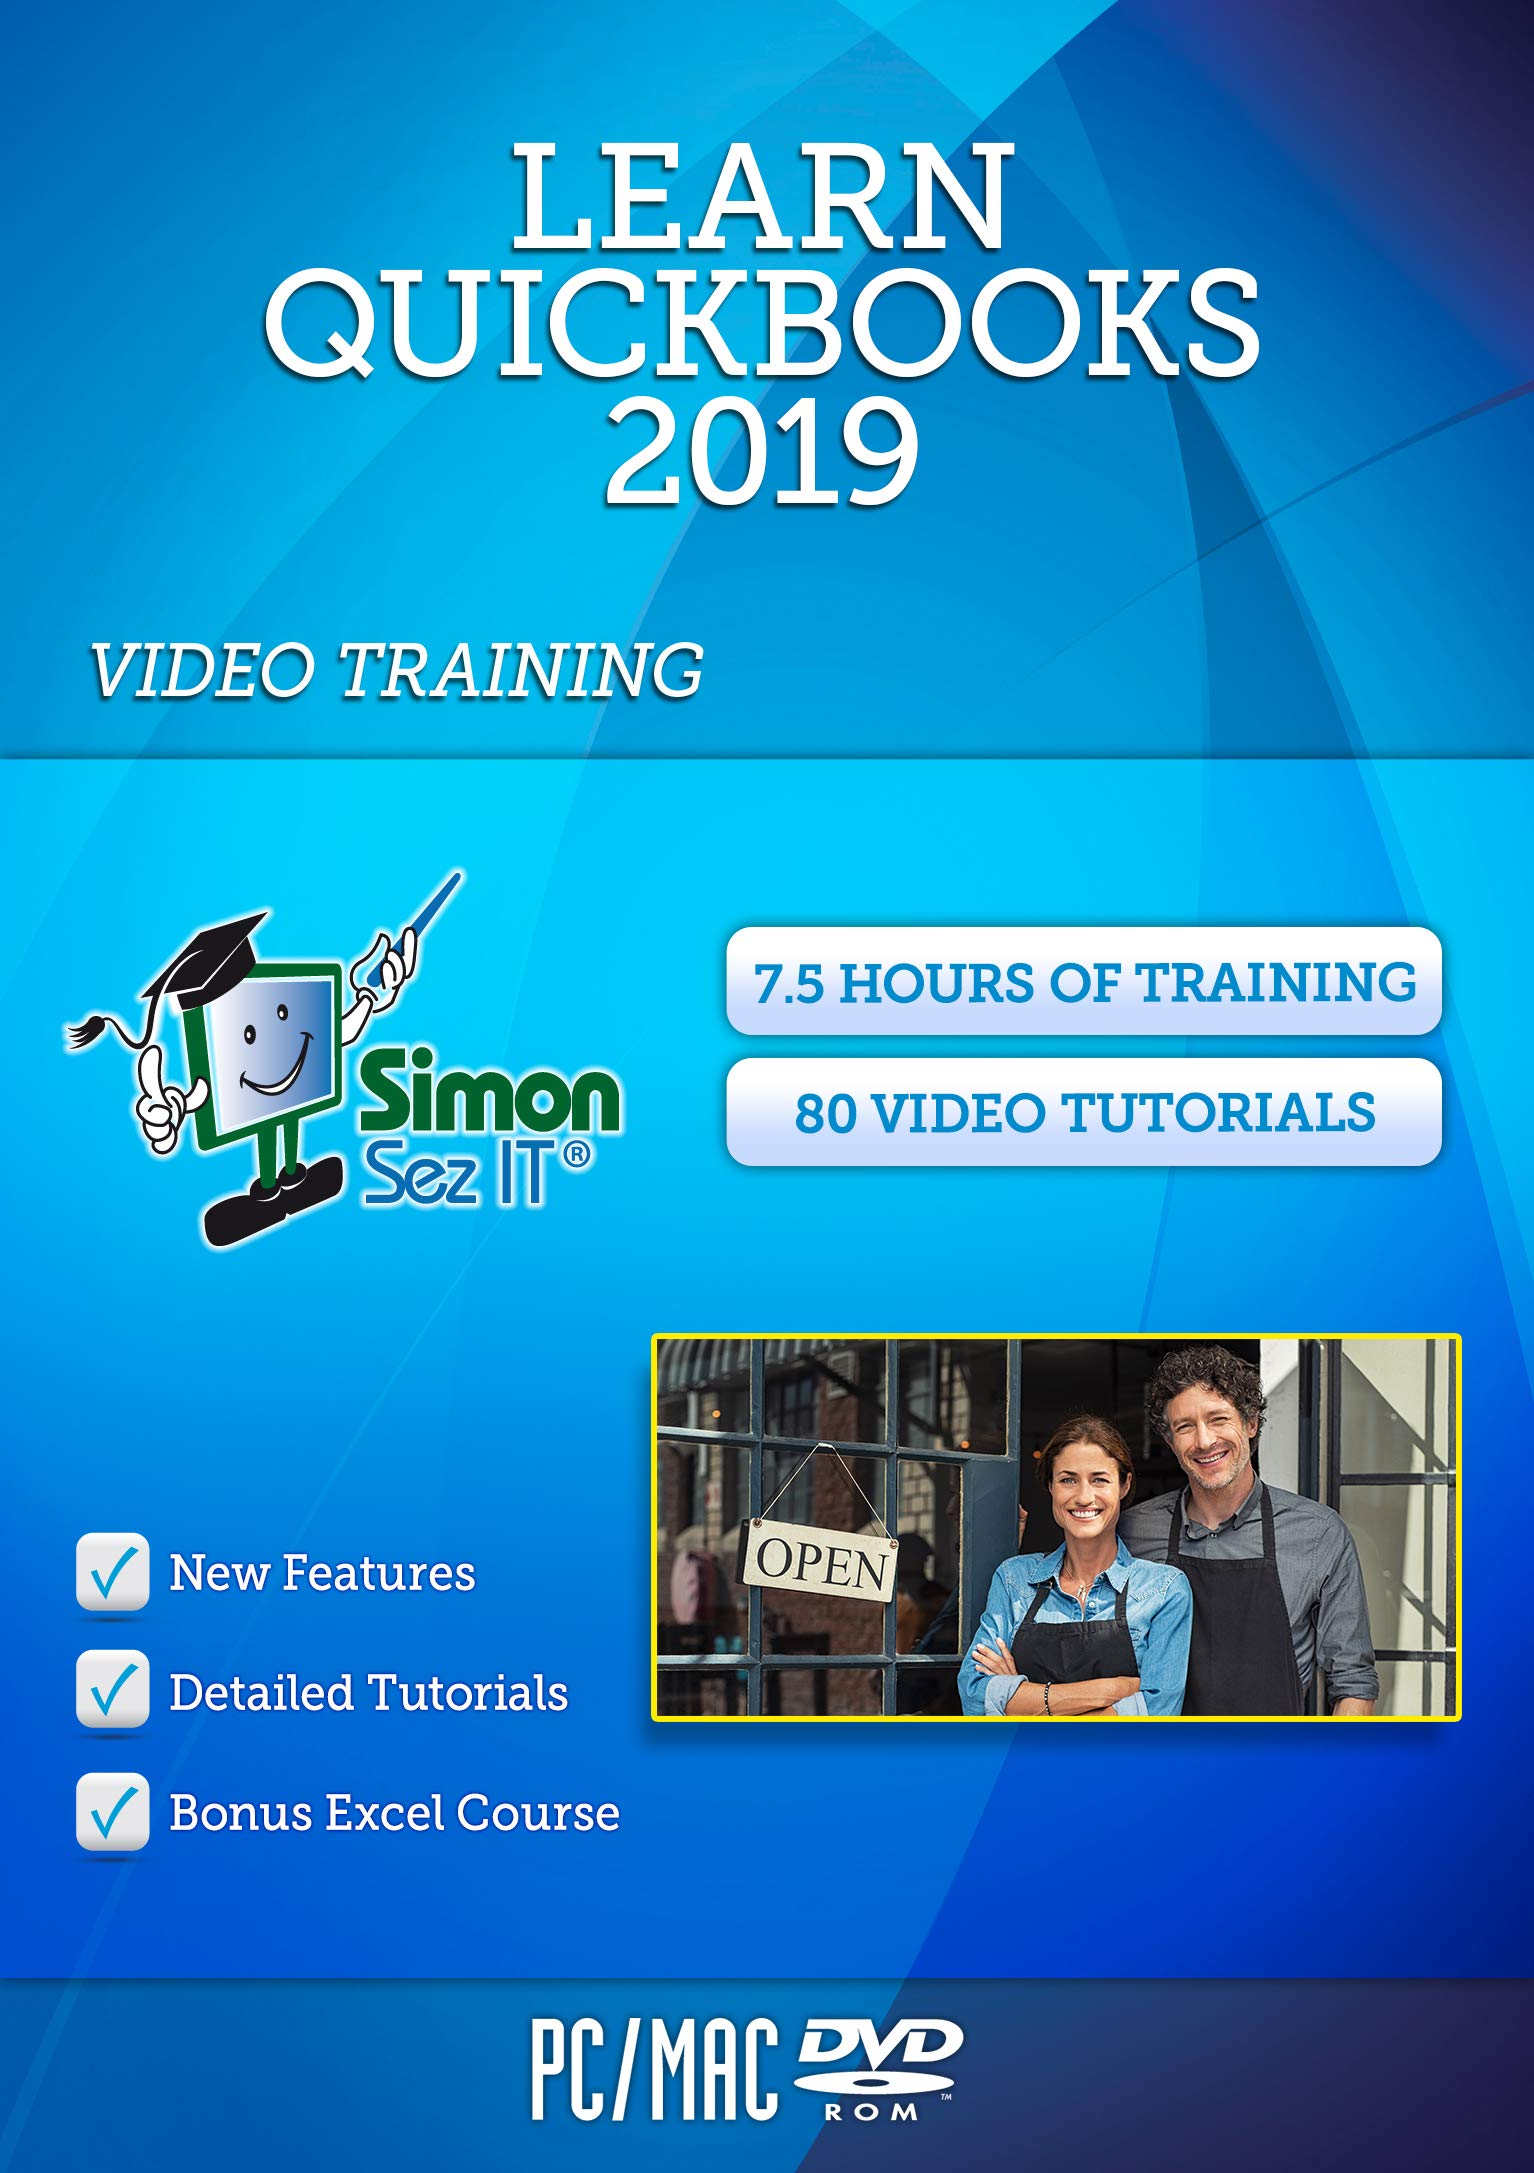 Master QuickBooks® 2019 Training Course by Simon Sez IT by Simon Sez IT